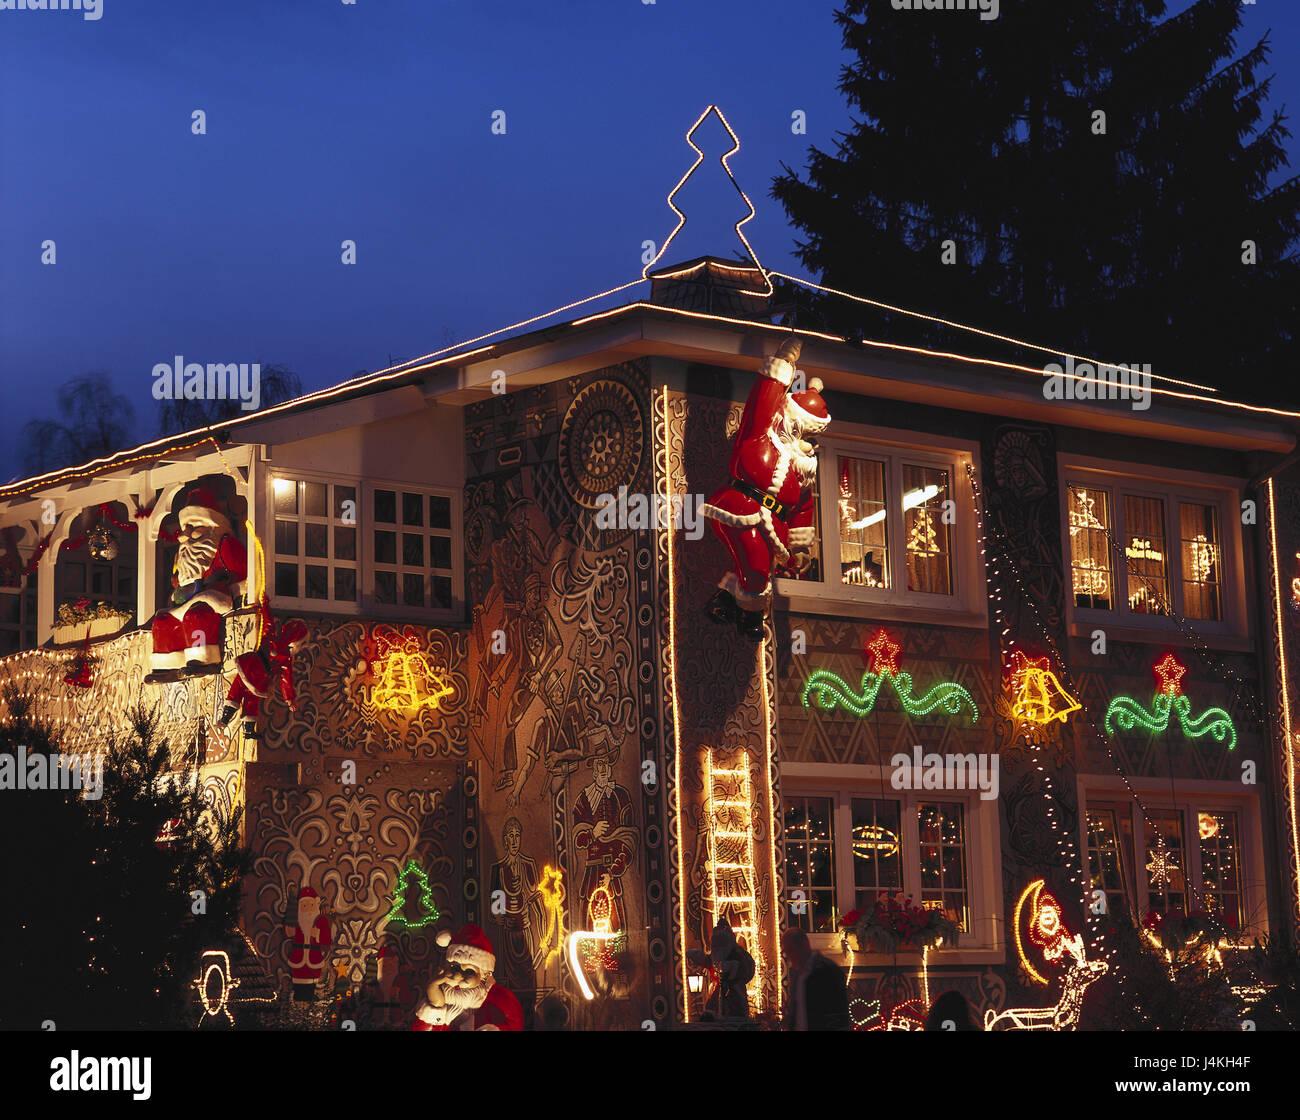 lights village house - photo #31